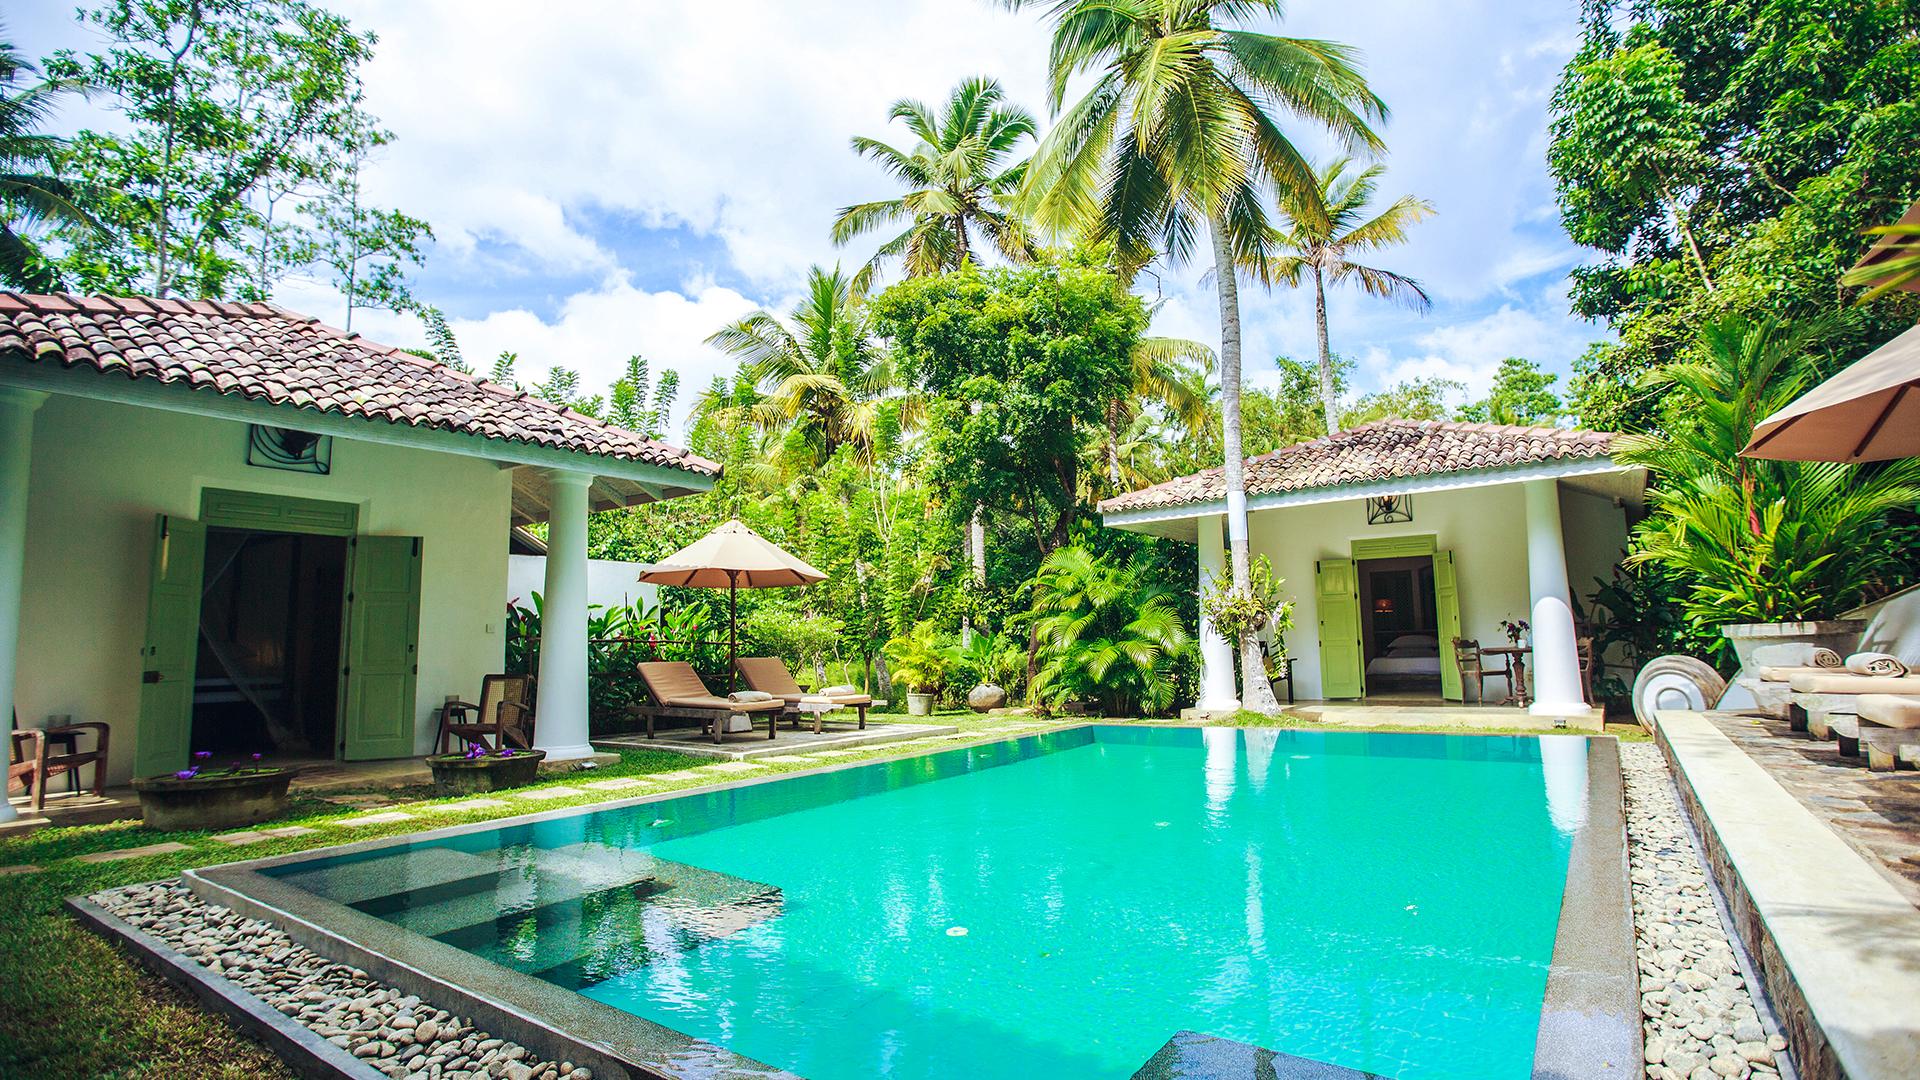 Sri_lanka_holiday_villa_gab_suiteArtboard 1 copy 4_1.jpg